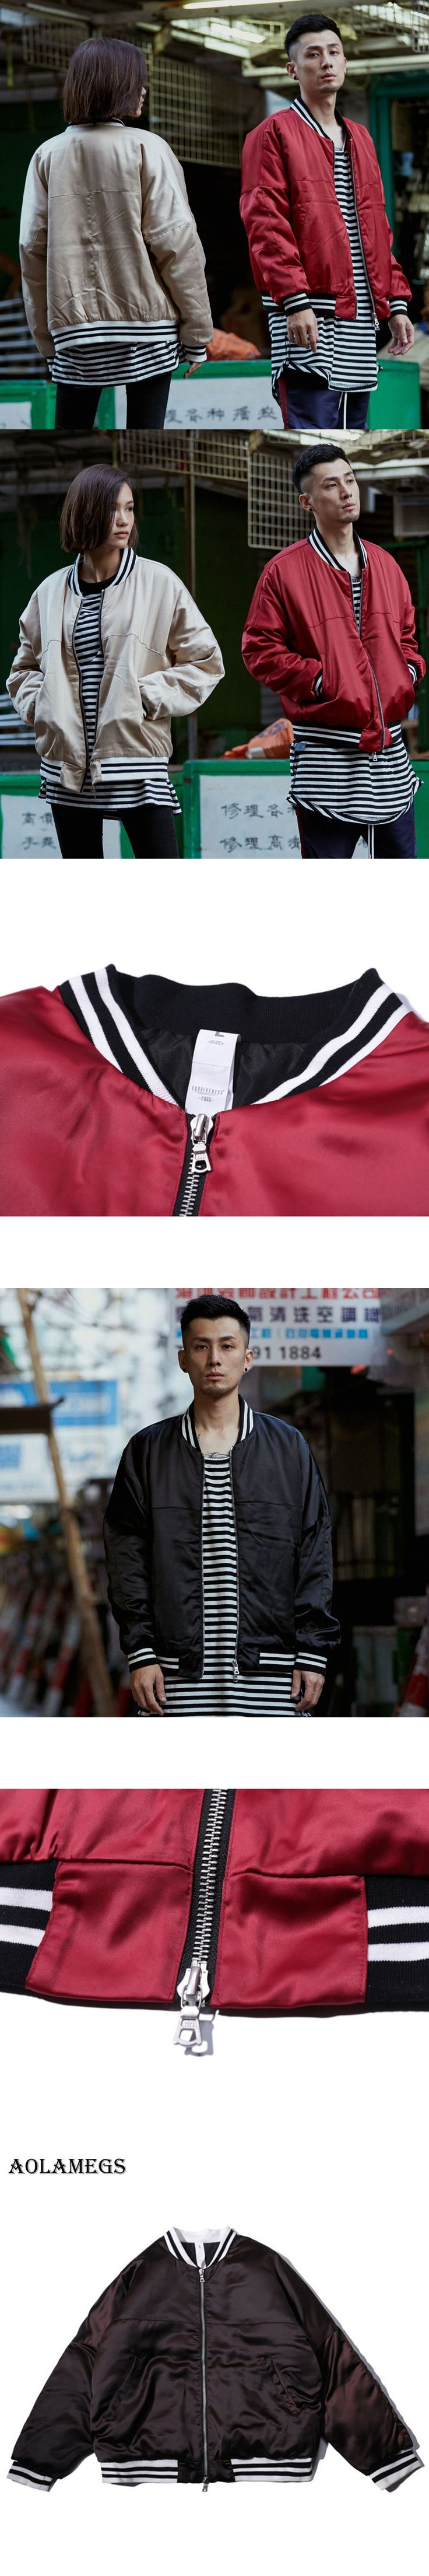 Aolamegs Mens Jacket Solid Baseball Couple MA-1 Pilot Bomber Jacket Casual Fashion Men's Coat Wind Breaker Jackets Men Autumn